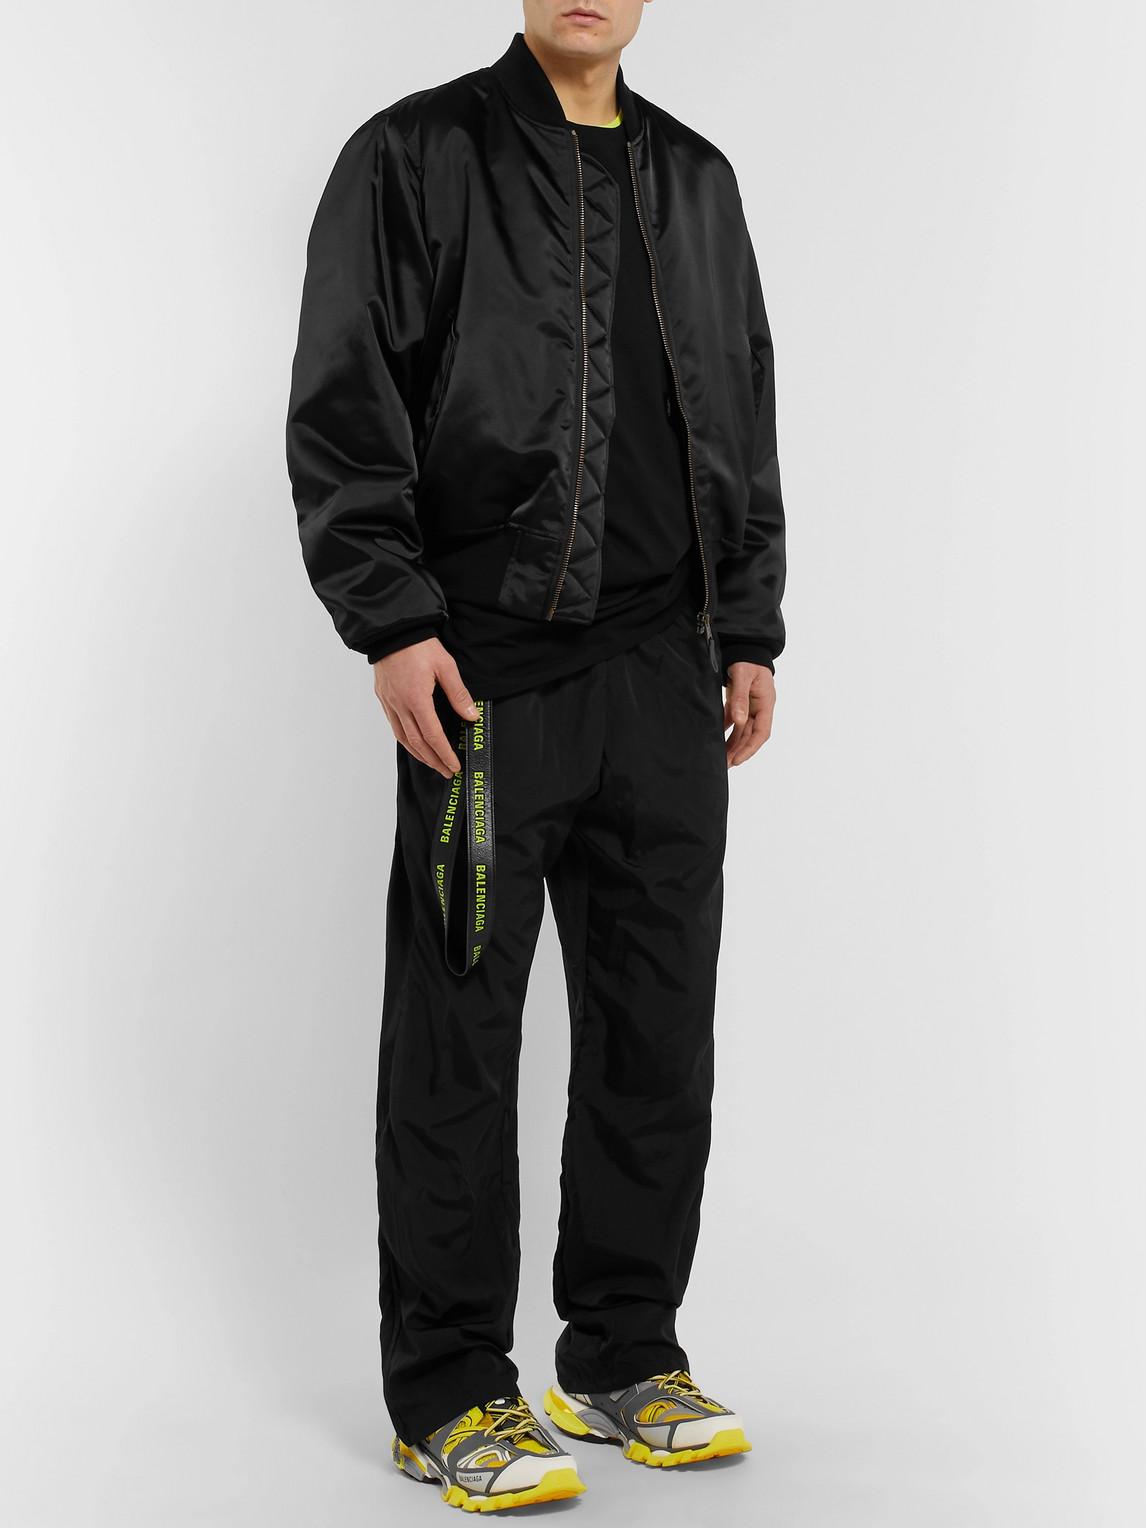 Balenciaga Jackets OVERSIZED EMBROIDERED SATIN BOMBER JACKET